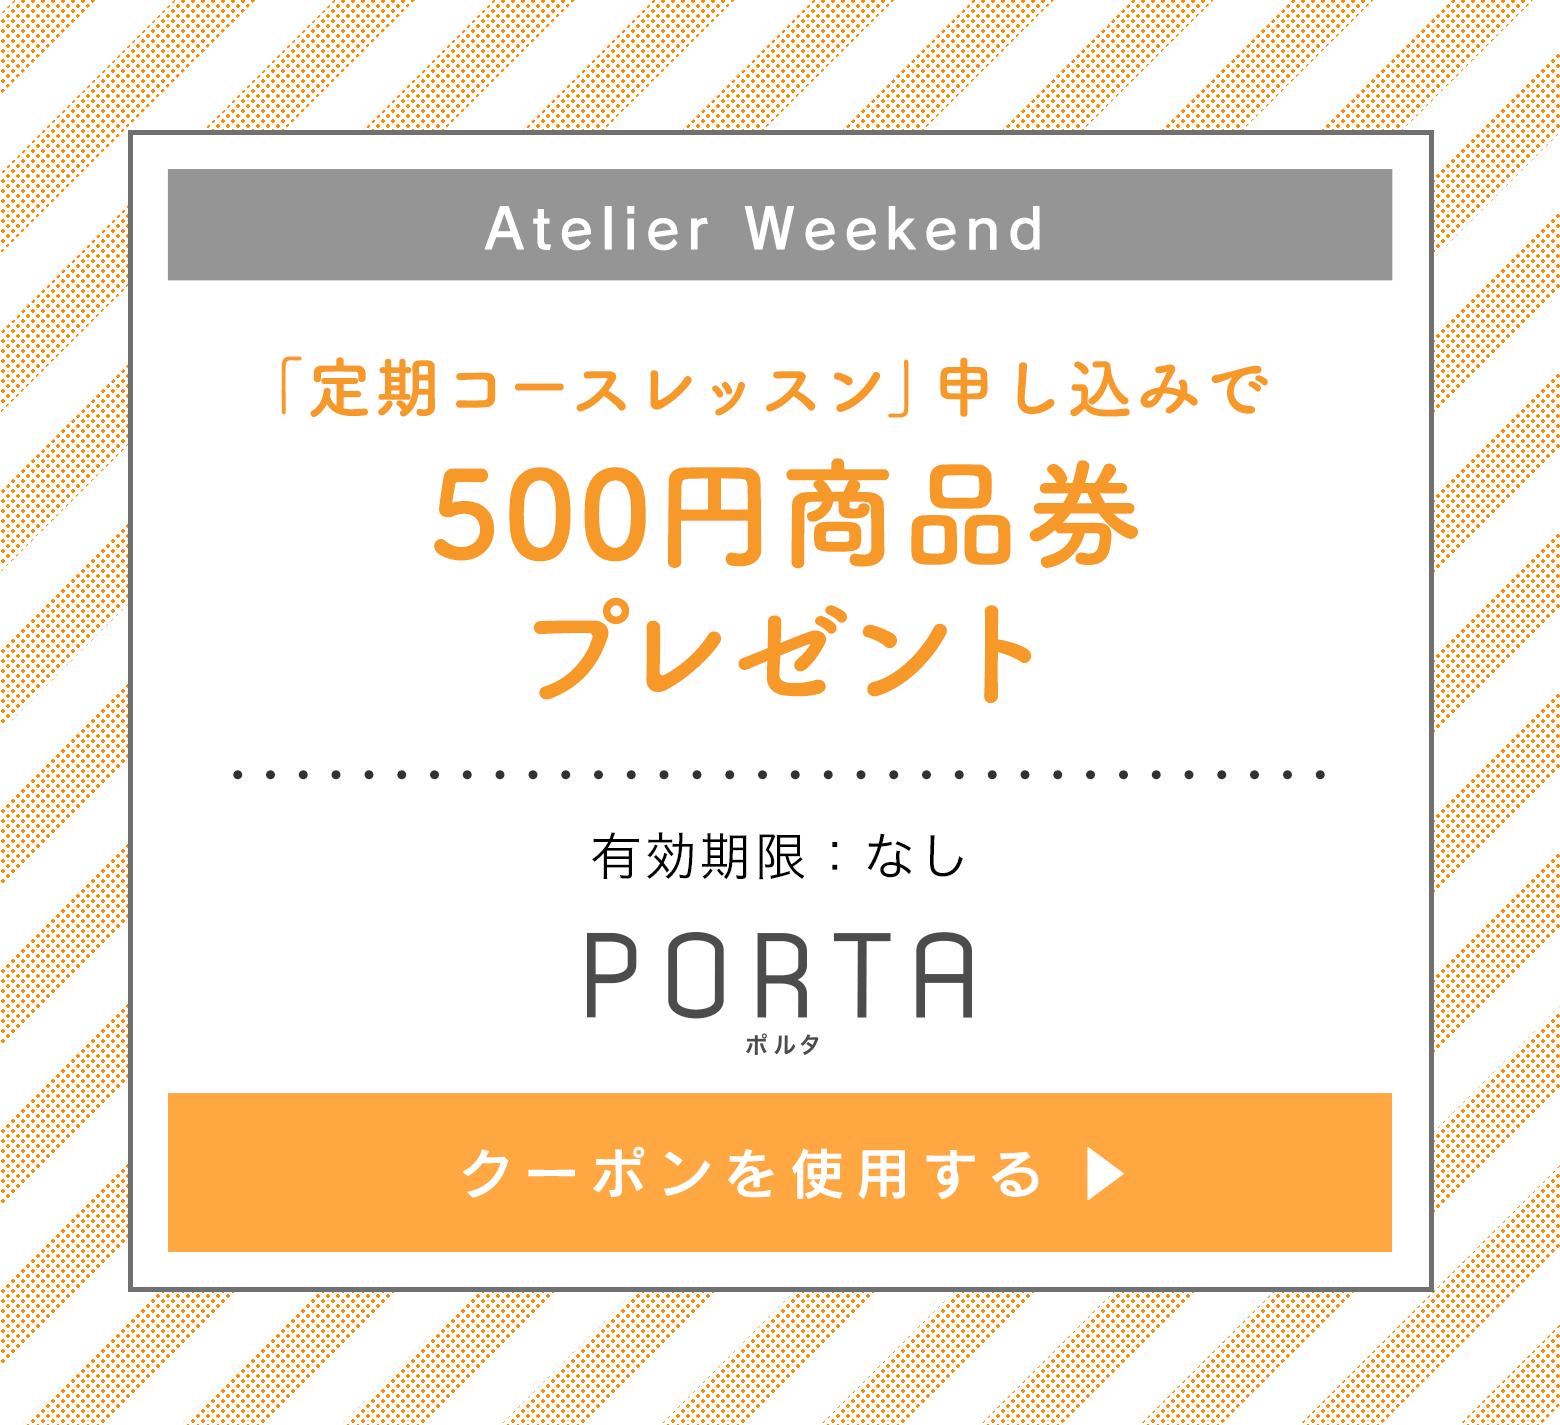 Atelier Weekend クーポン 定期コースレッスン申し込みで500円商品券プレゼント のクーポンを使う